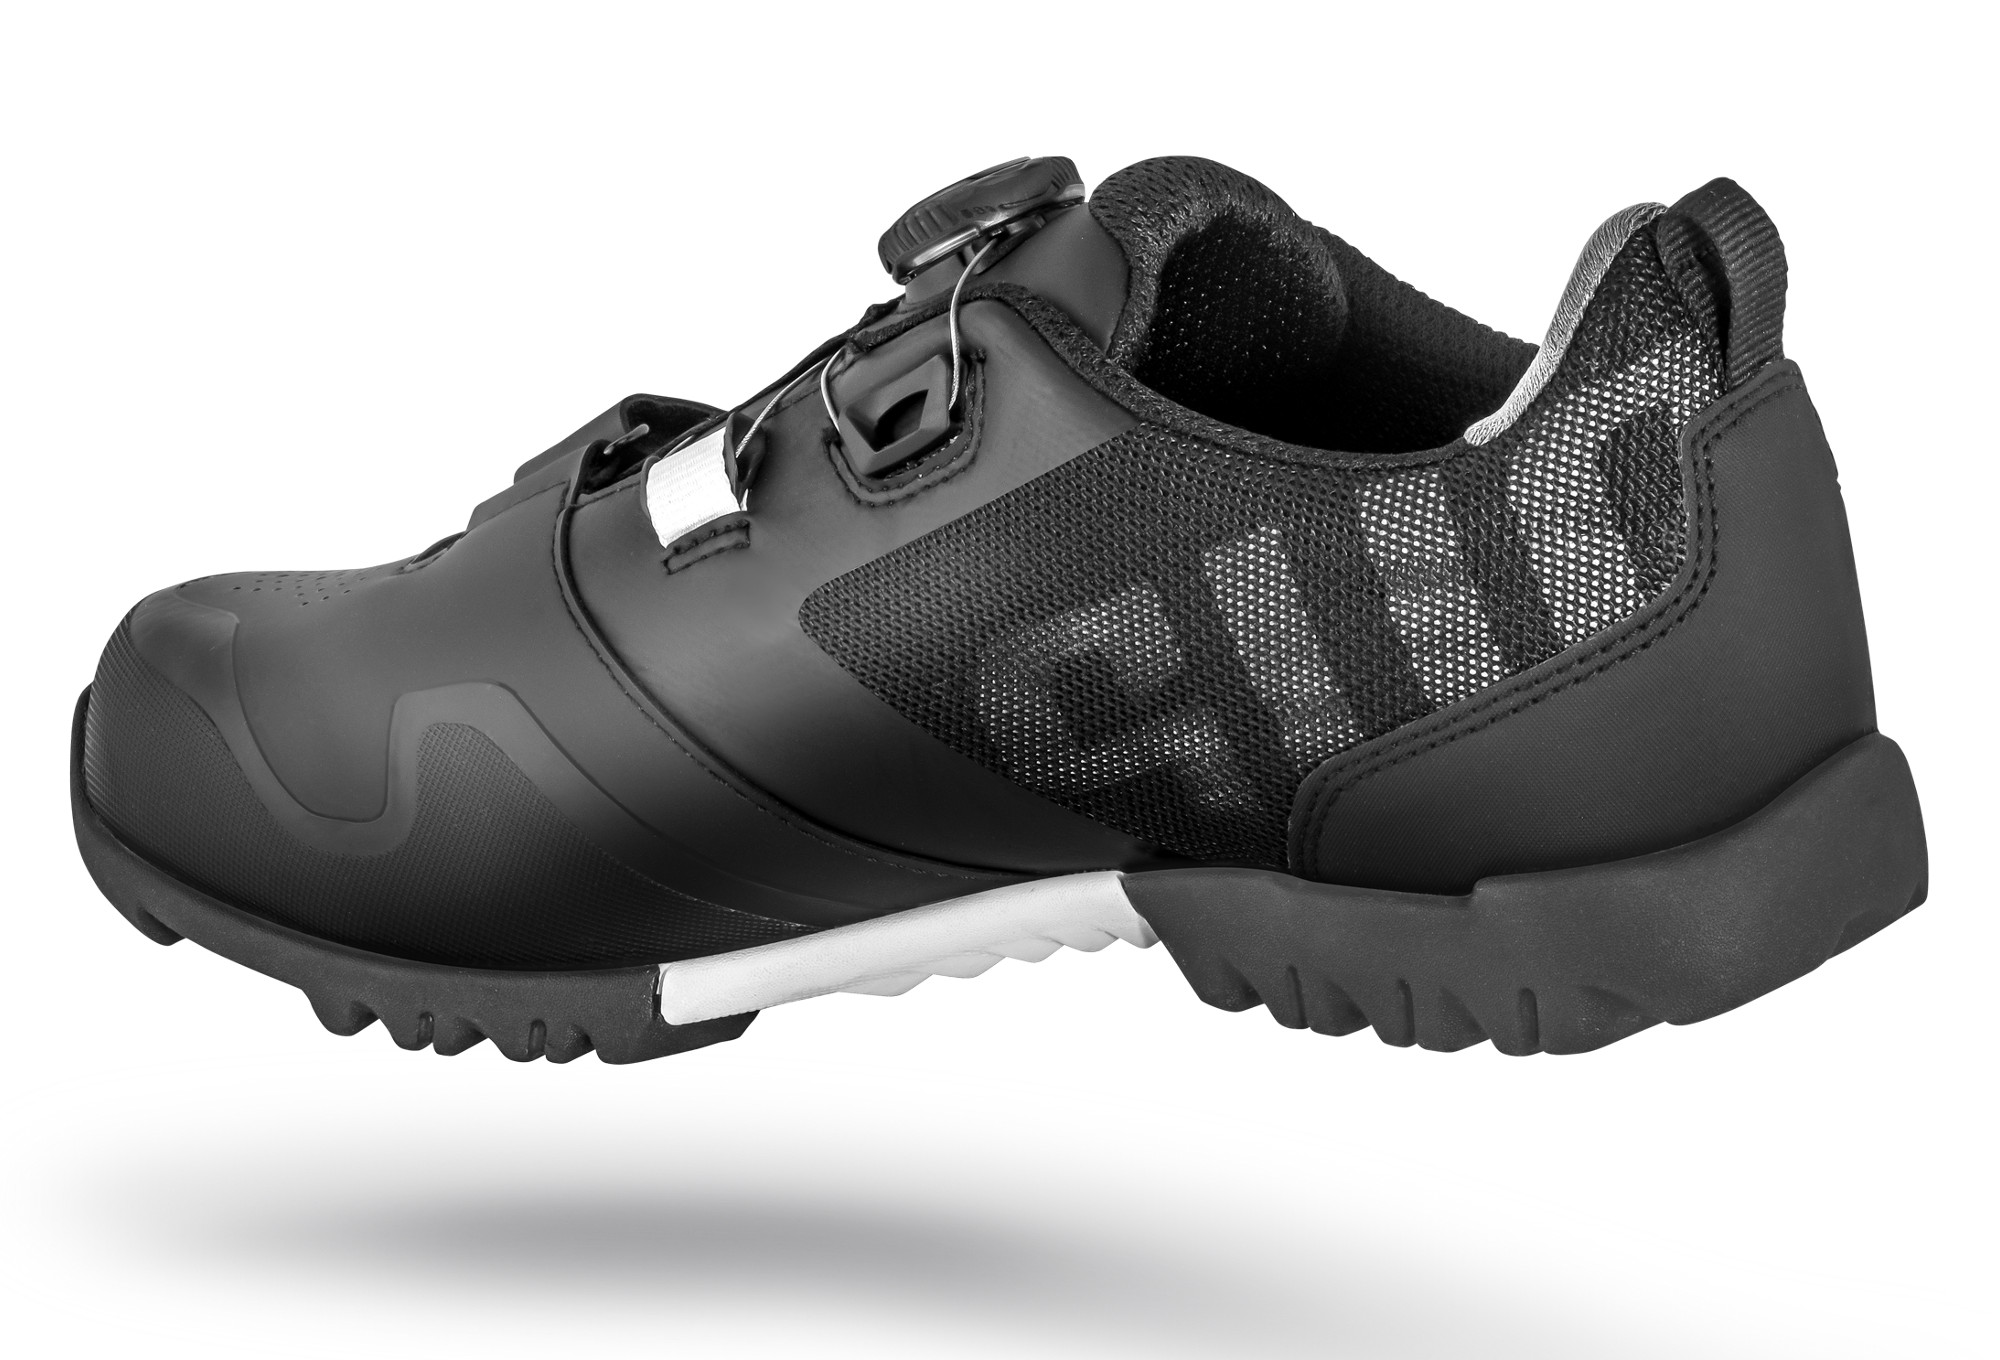 f586e67320b Suplest Offroad Pro MTB Shoes Black